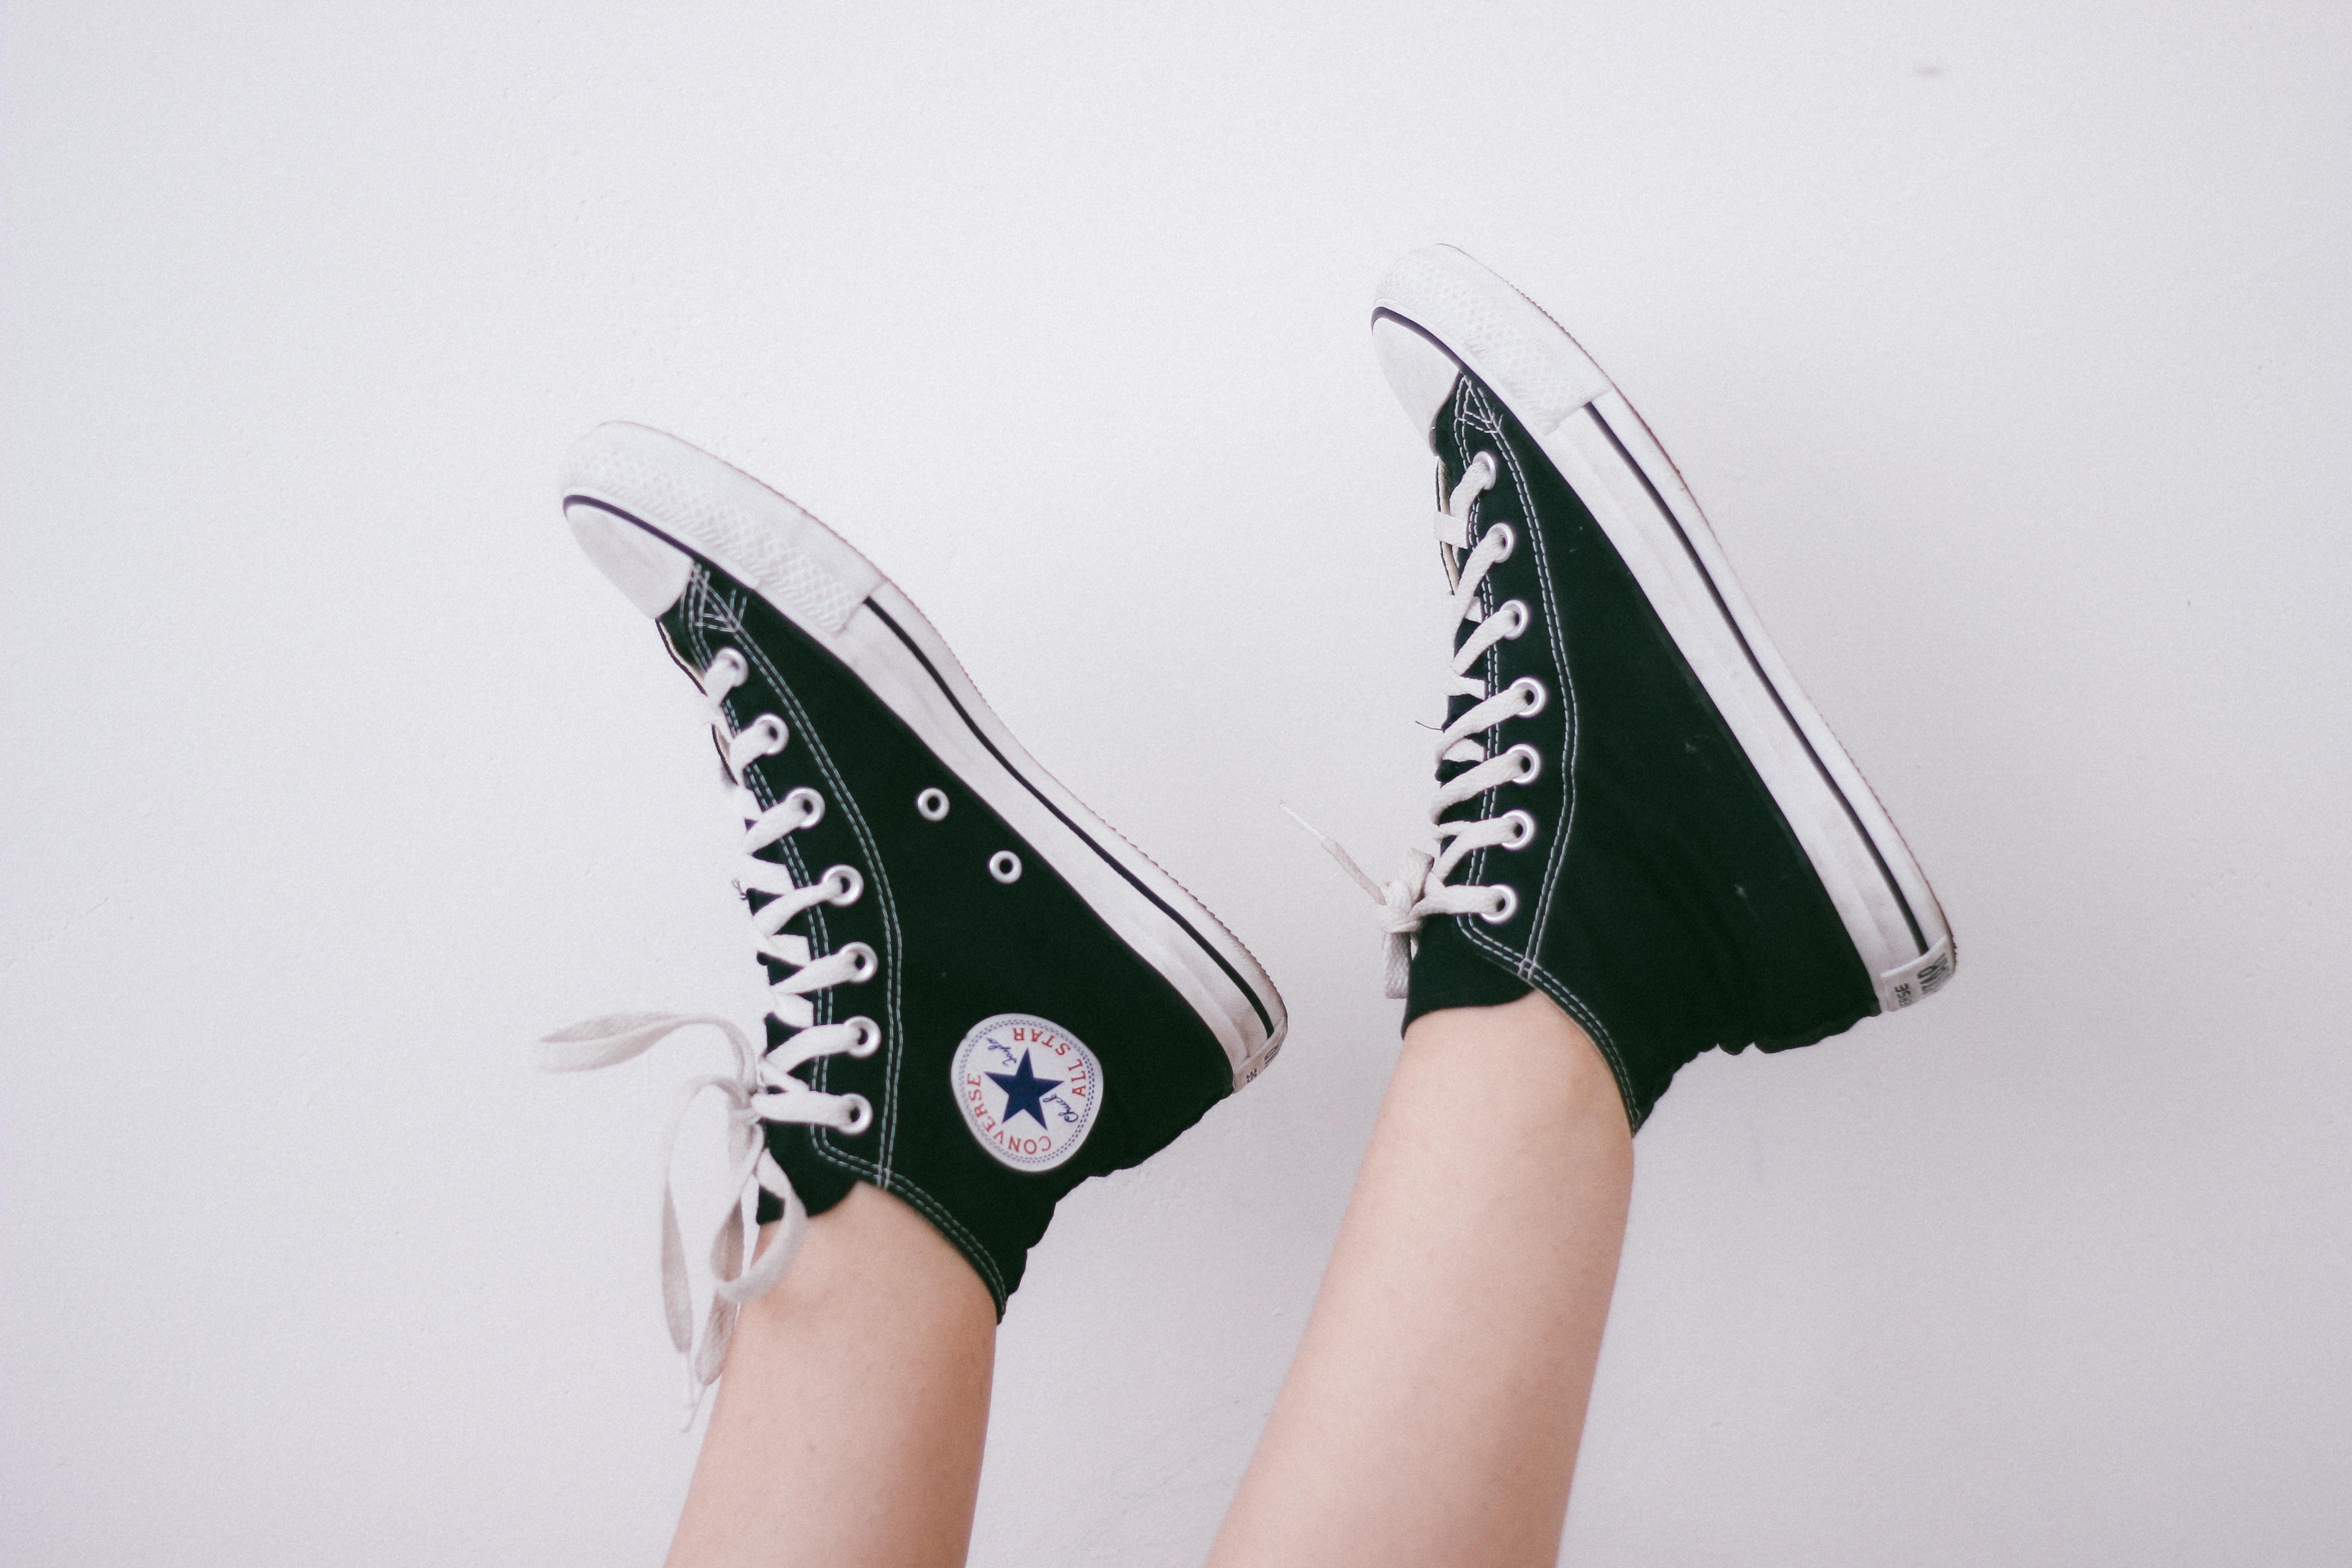 b0f3913485b66 Free Images : shoe, wing, white, sneaker, fashion, clothing ...